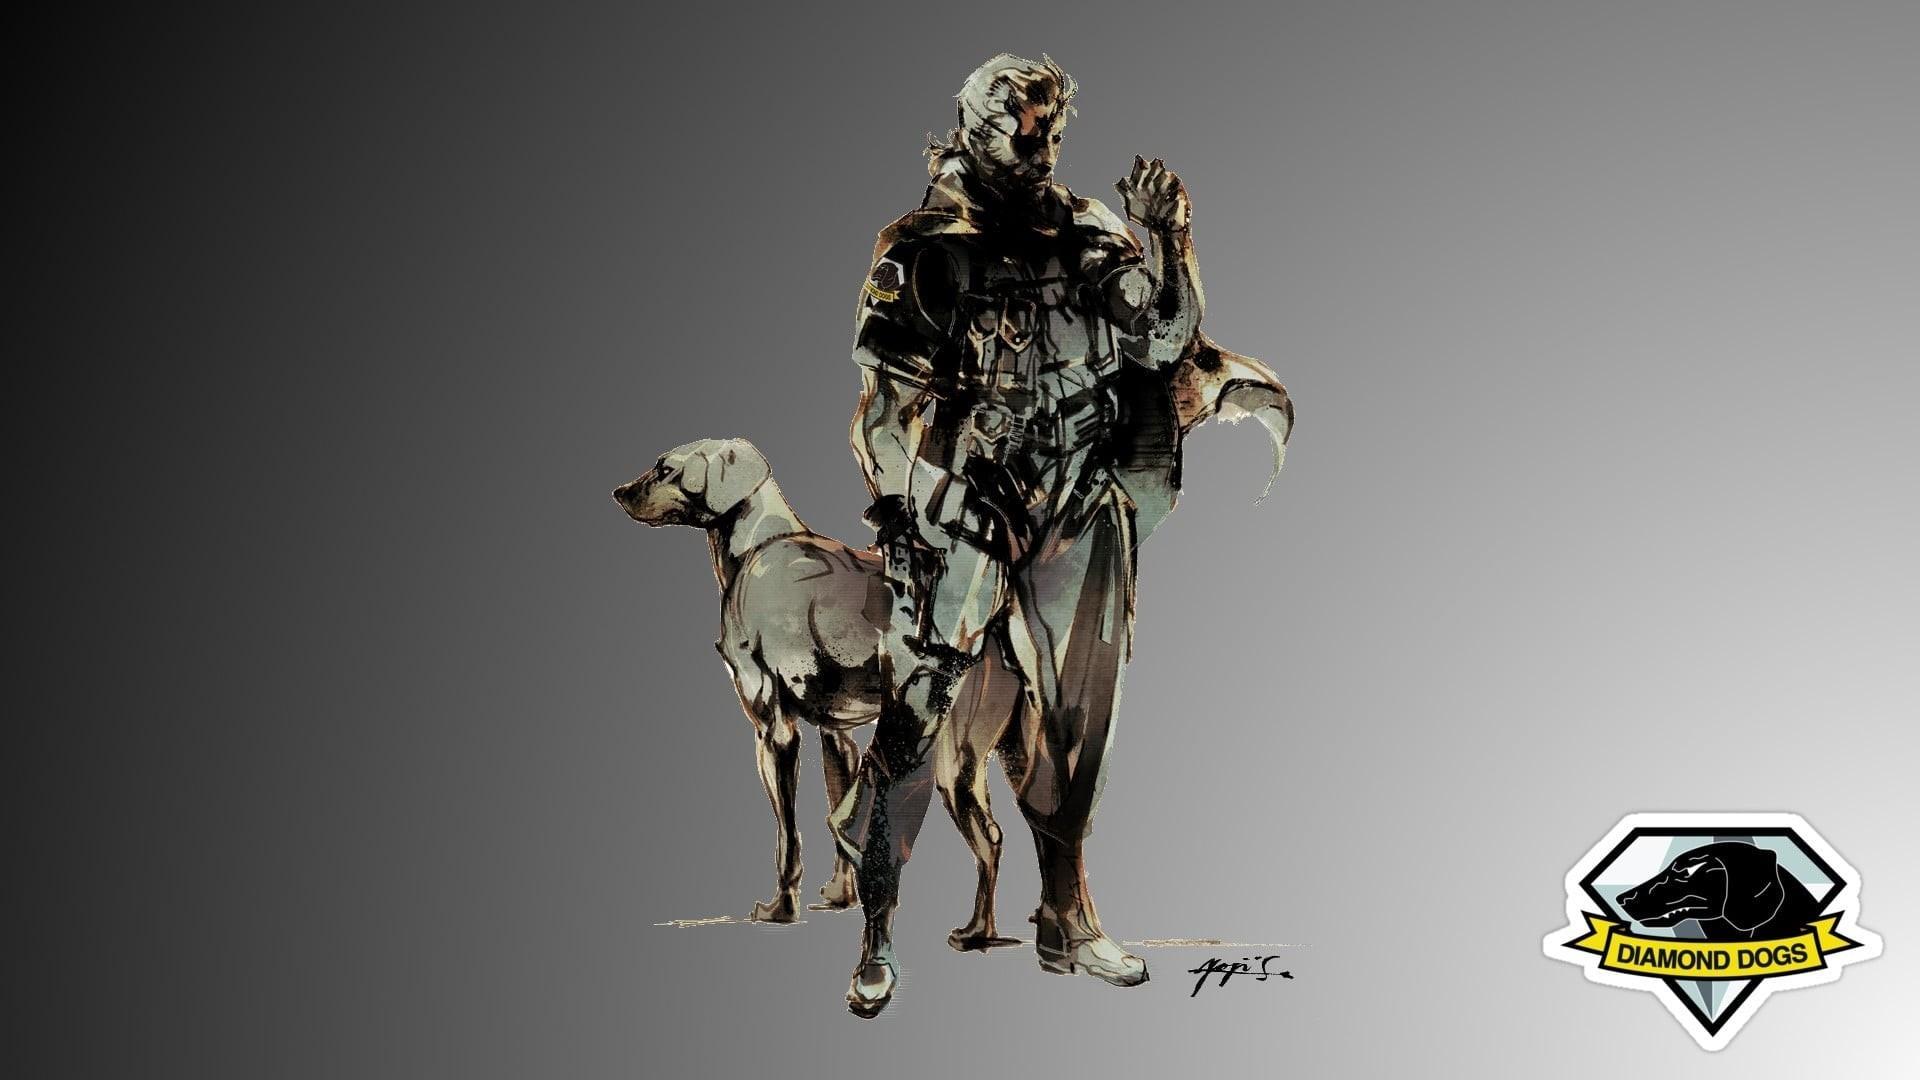 Metal Gear Solid 5 The Phantom Pain free download